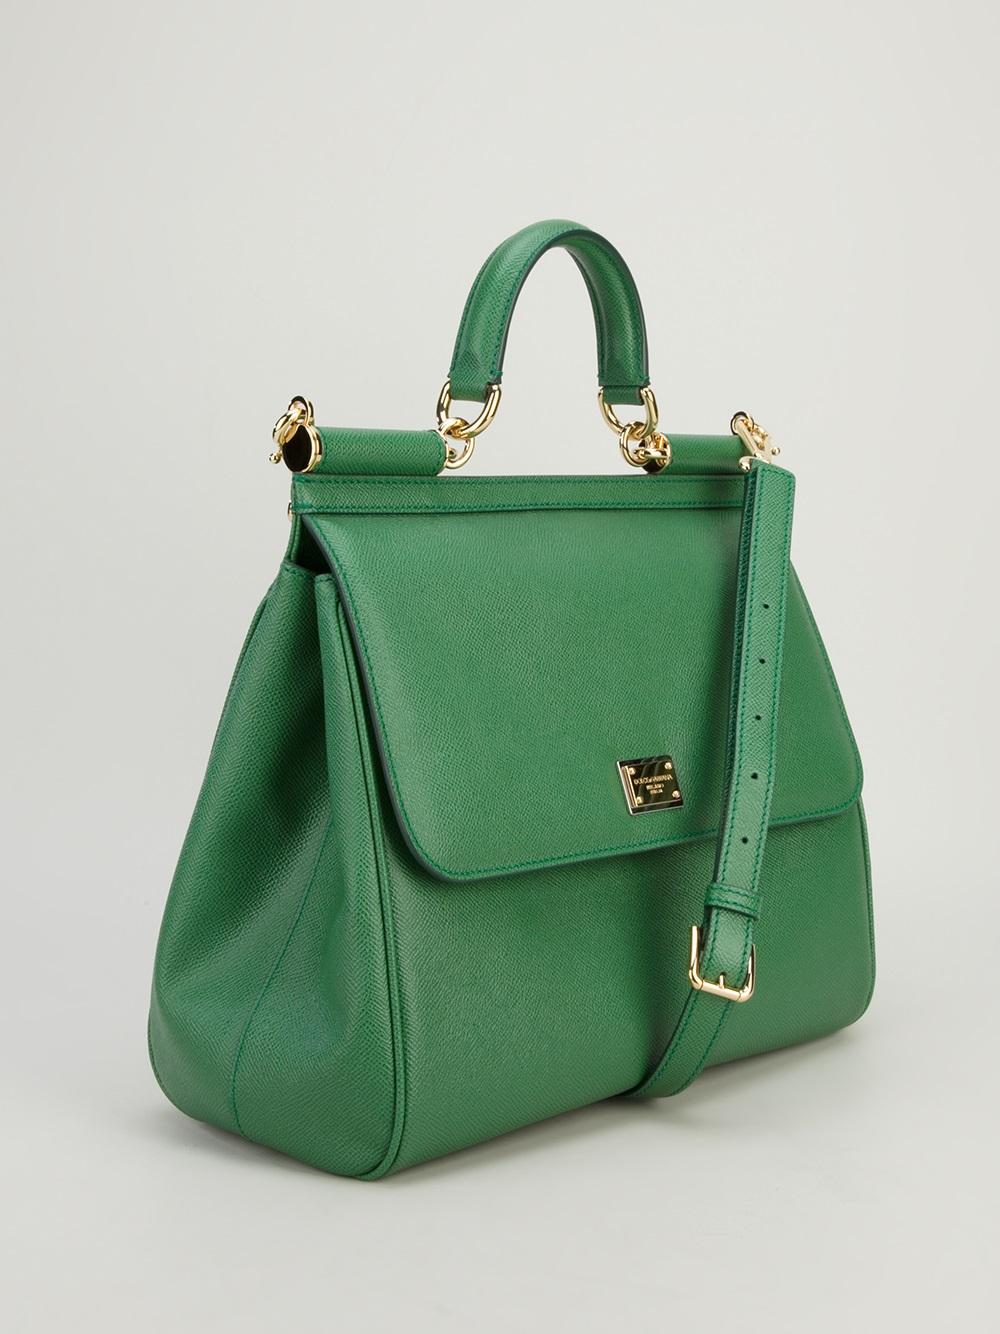 Dolce And Gabbana Green Bag - Best Photos Skirt and Bag ... 31c5ef639adbf